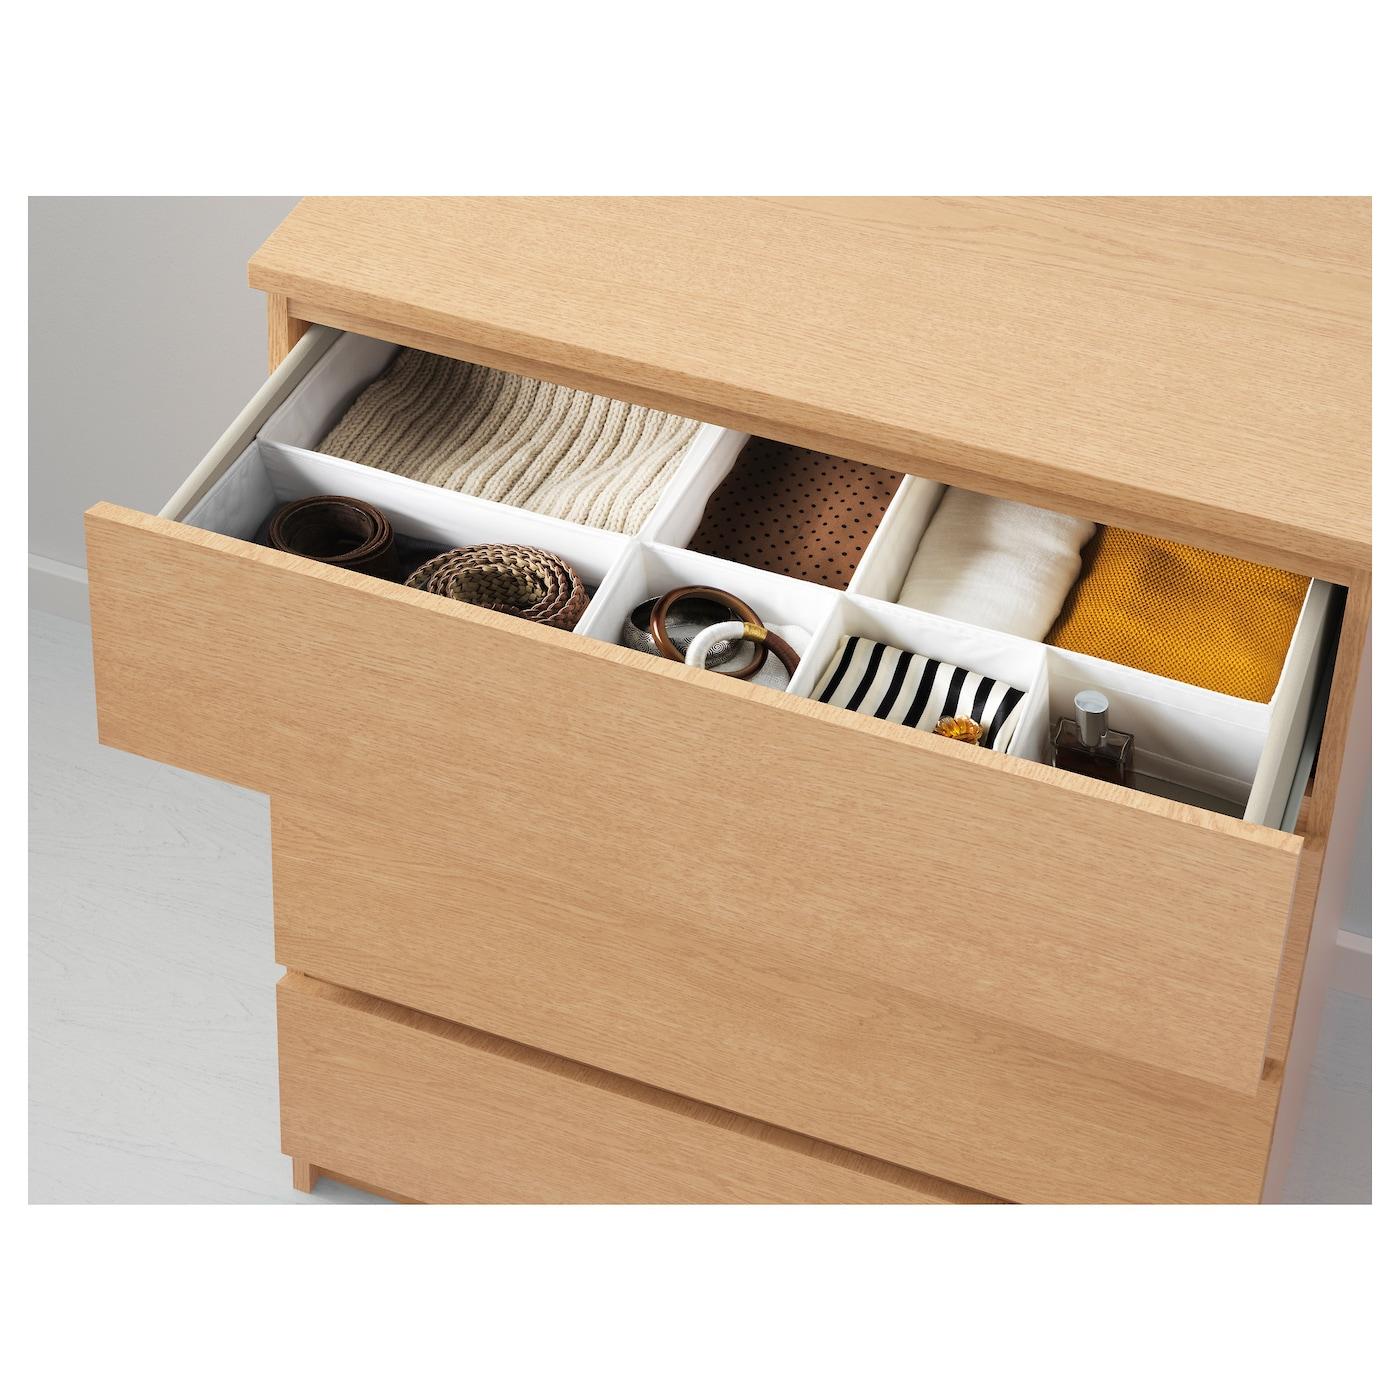 malm chest of 4 drawers oak veneer 80x100 cm ikea. Black Bedroom Furniture Sets. Home Design Ideas